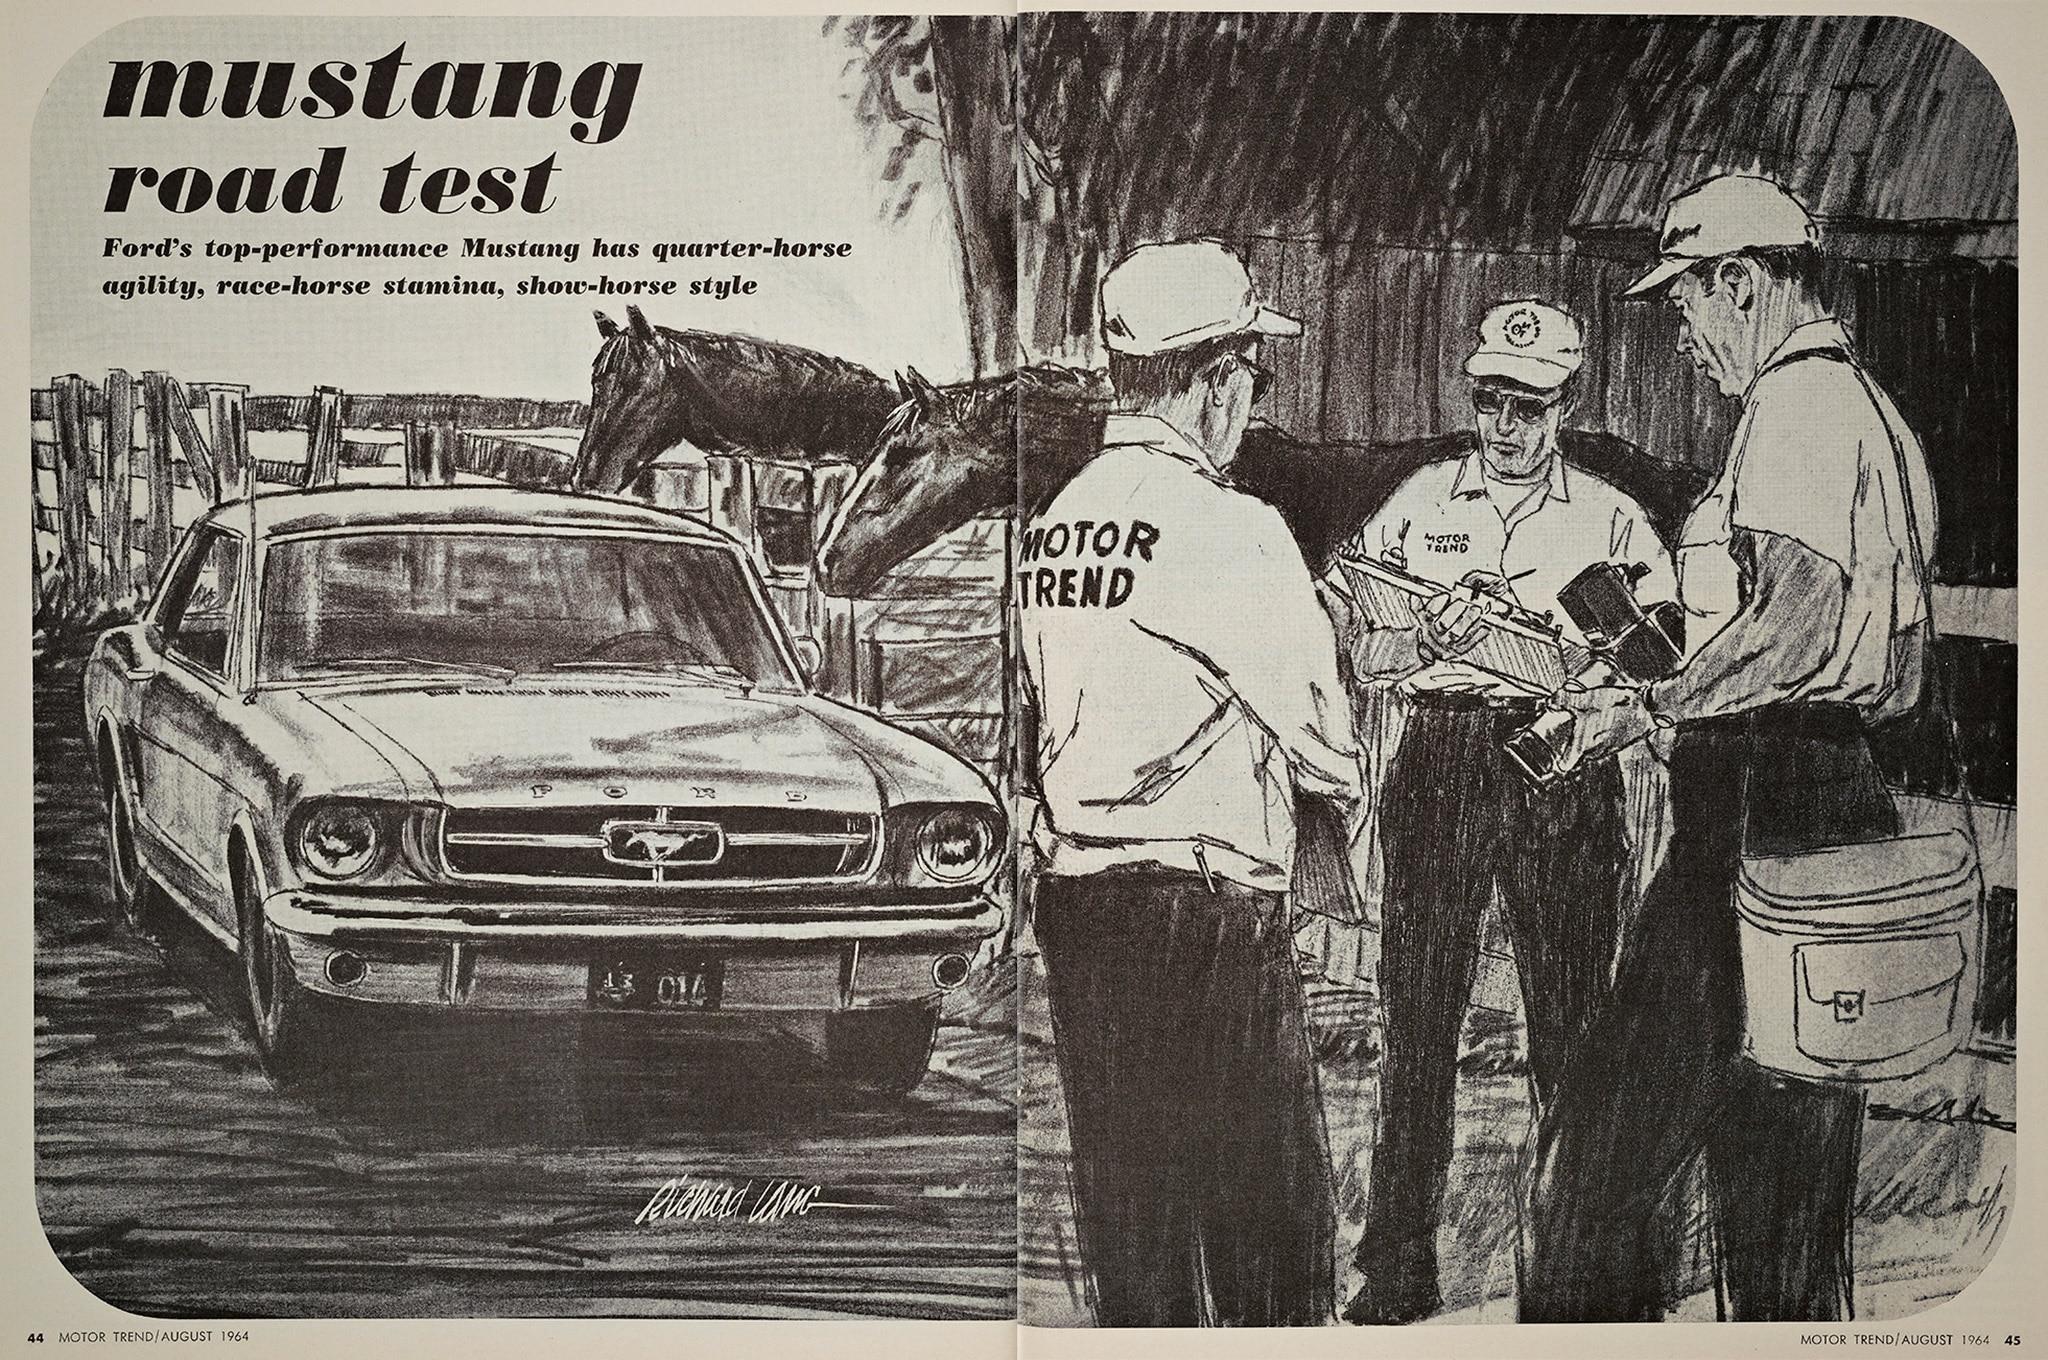 August 1964 Motor Trend Mustang Road Test Story Sketch